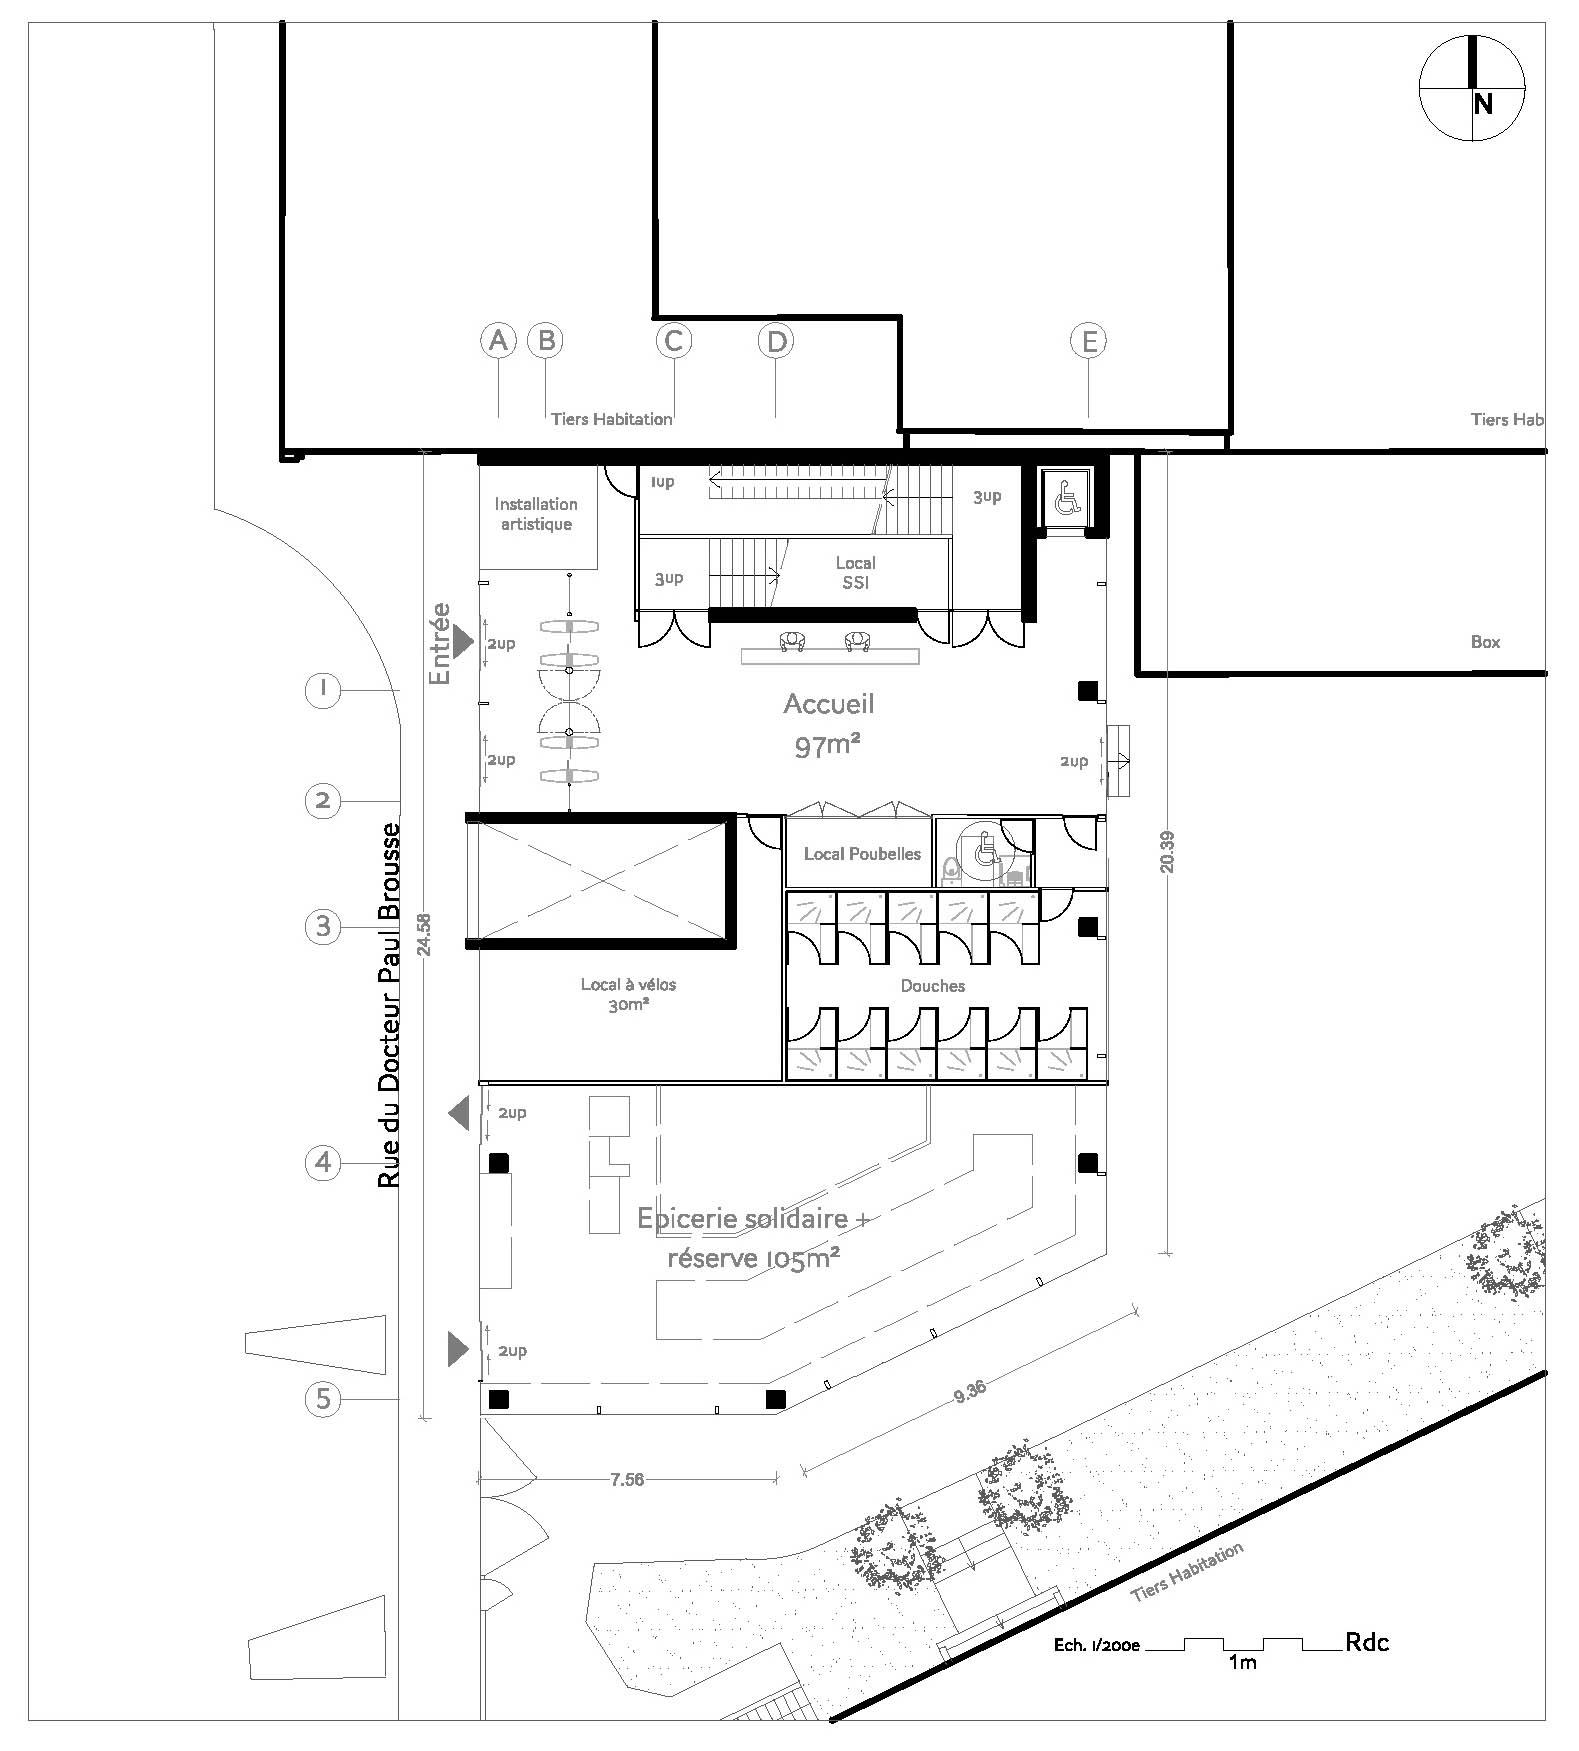 reinventer - paris- noc 42 - xavier - niel - ar - Studio - architectures - ecole 42   Kwame YAMGNANE nicolas sadirac - free (16).jpg